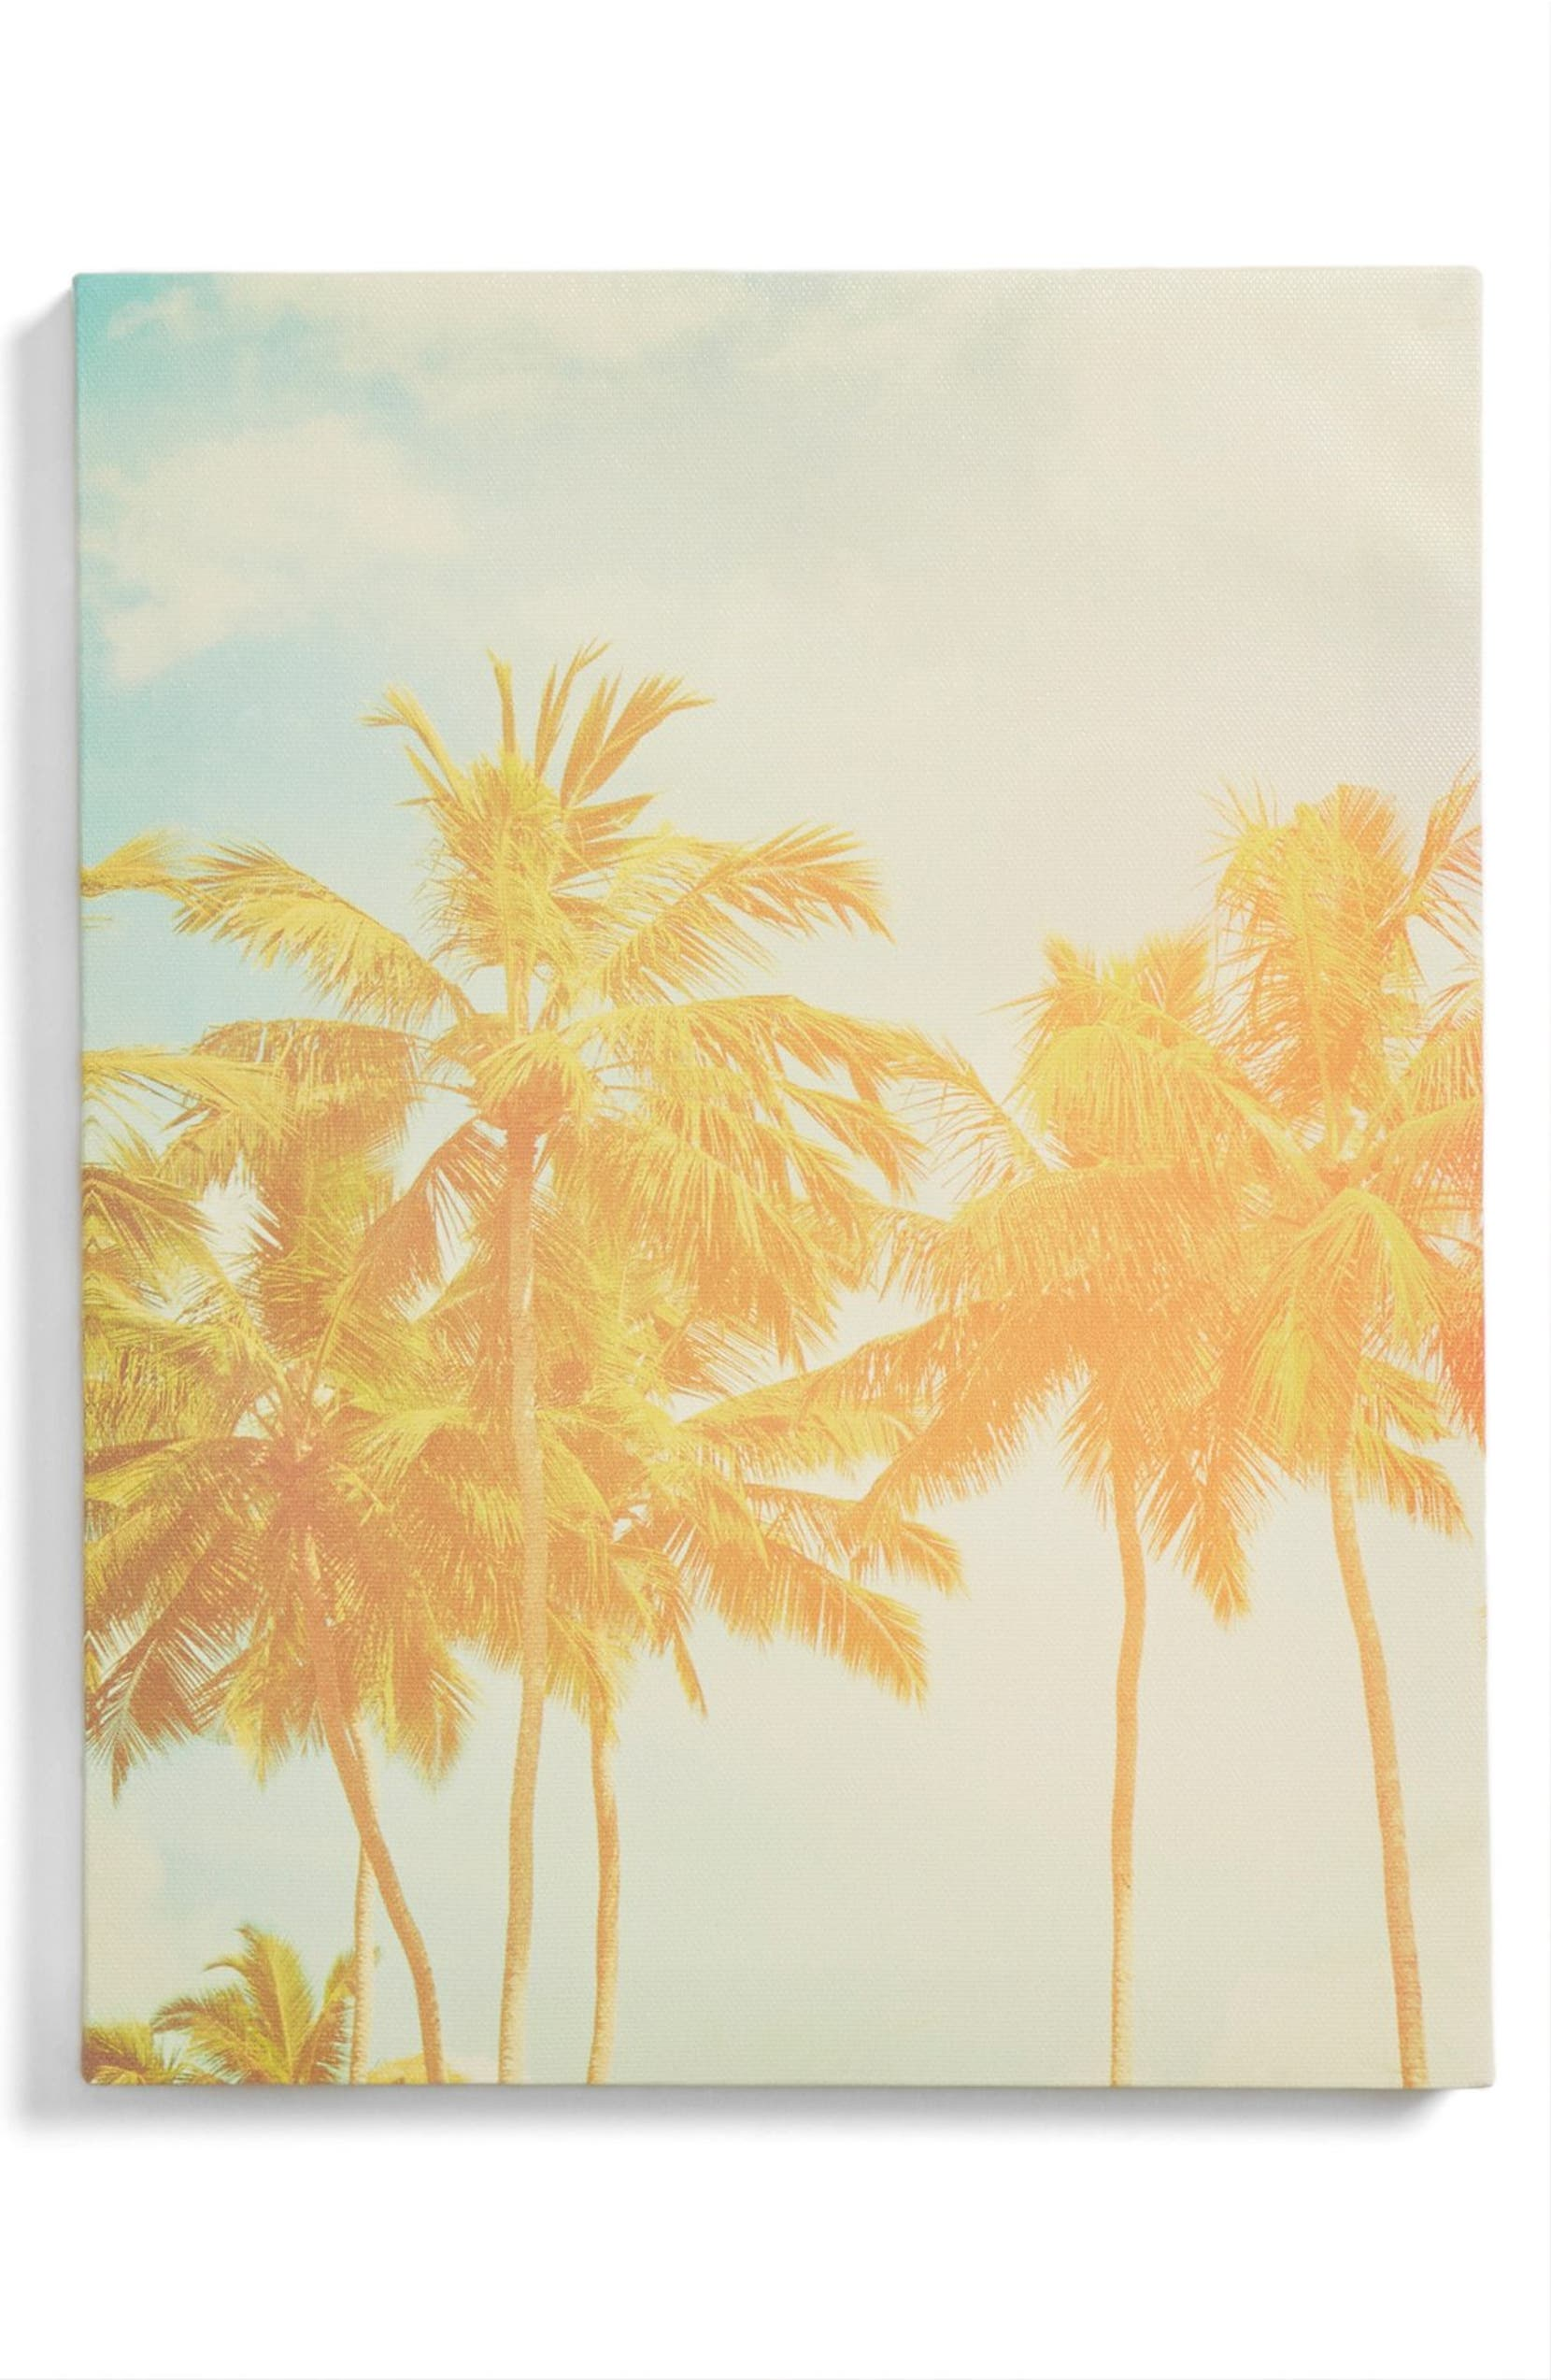 Ankit Palm Tree Wall Art | Nordstrom